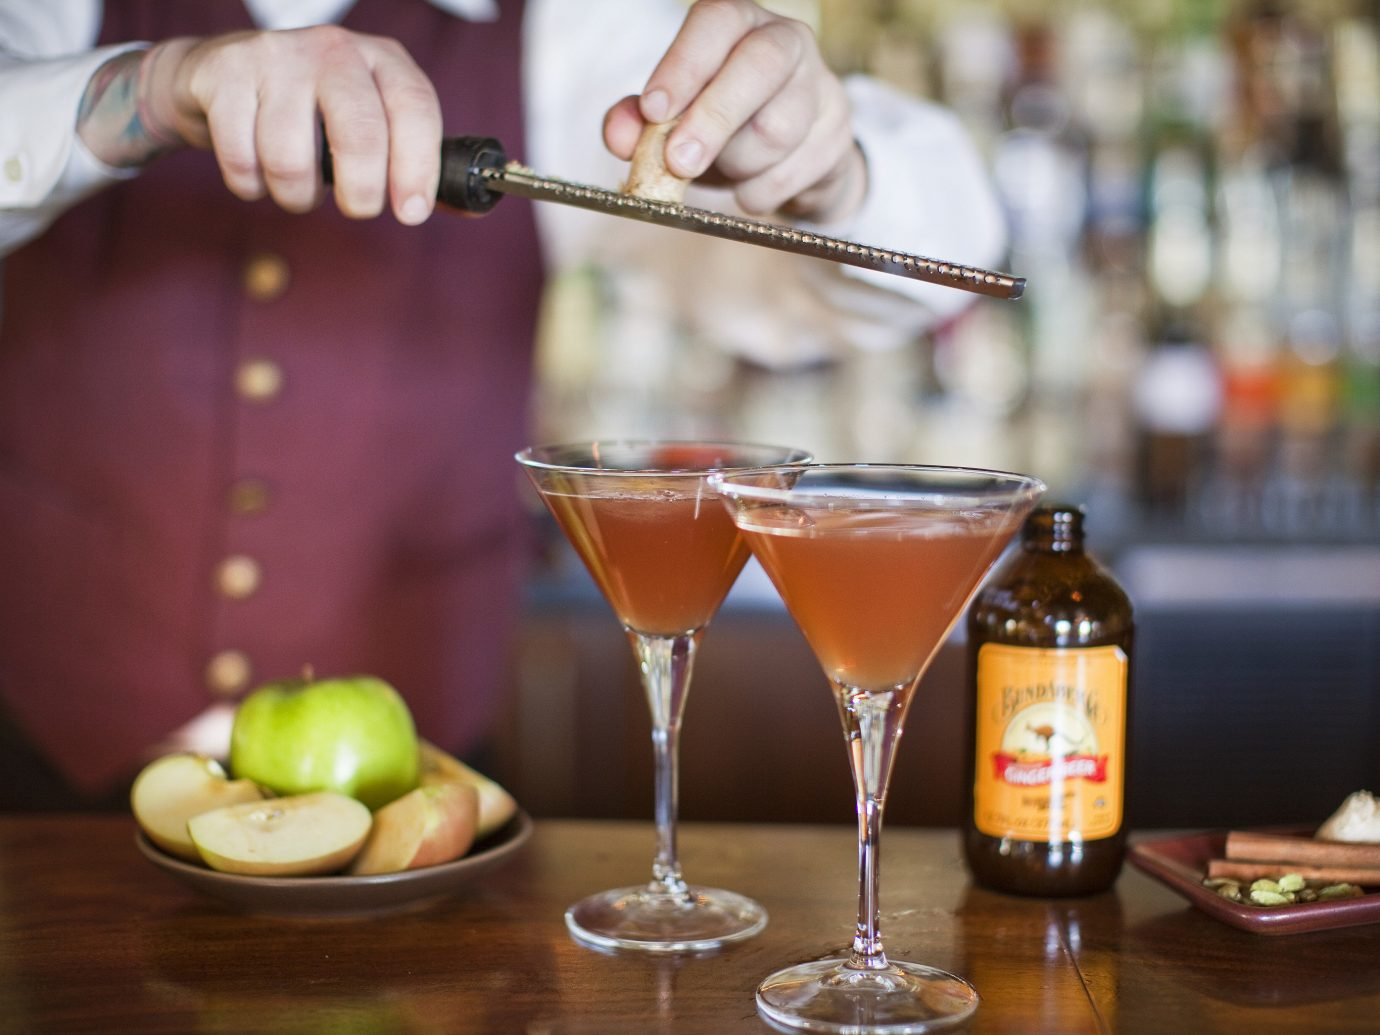 Hotels table person alcoholic beverage Drink cocktail distilled beverage liqueur food